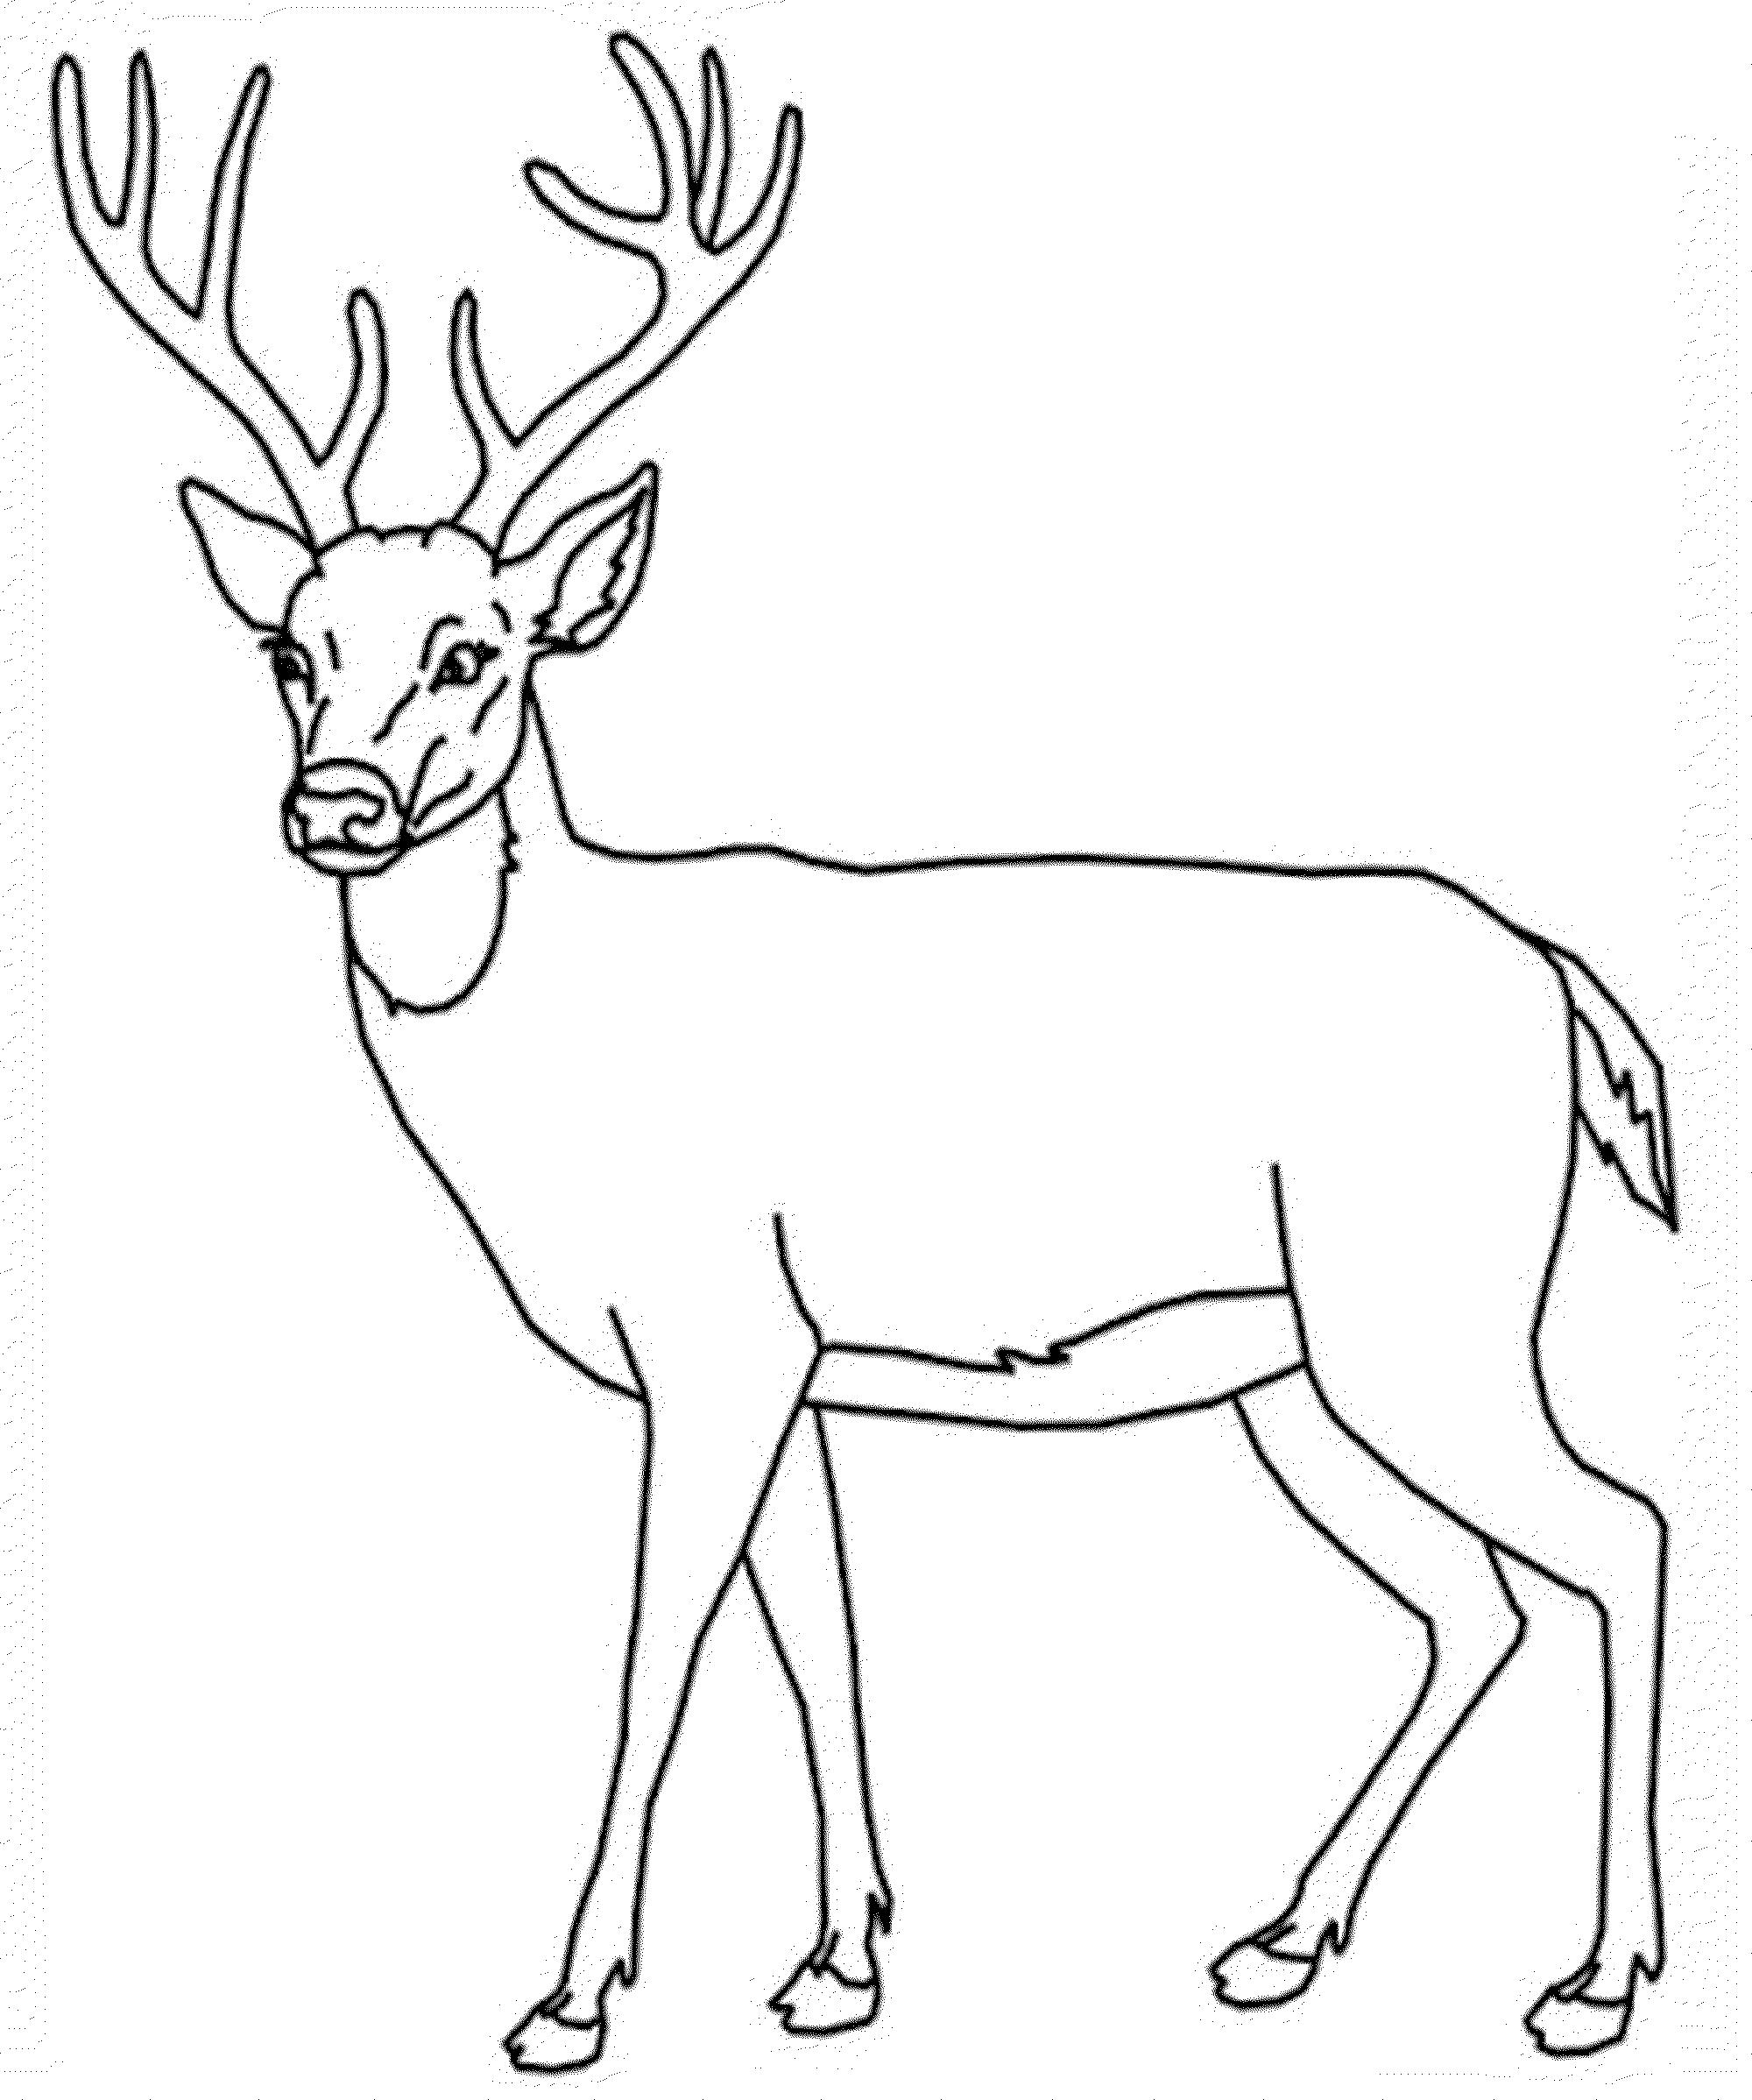 deer coloring sheet deer coloring pages kidsuki coloring sheet deer